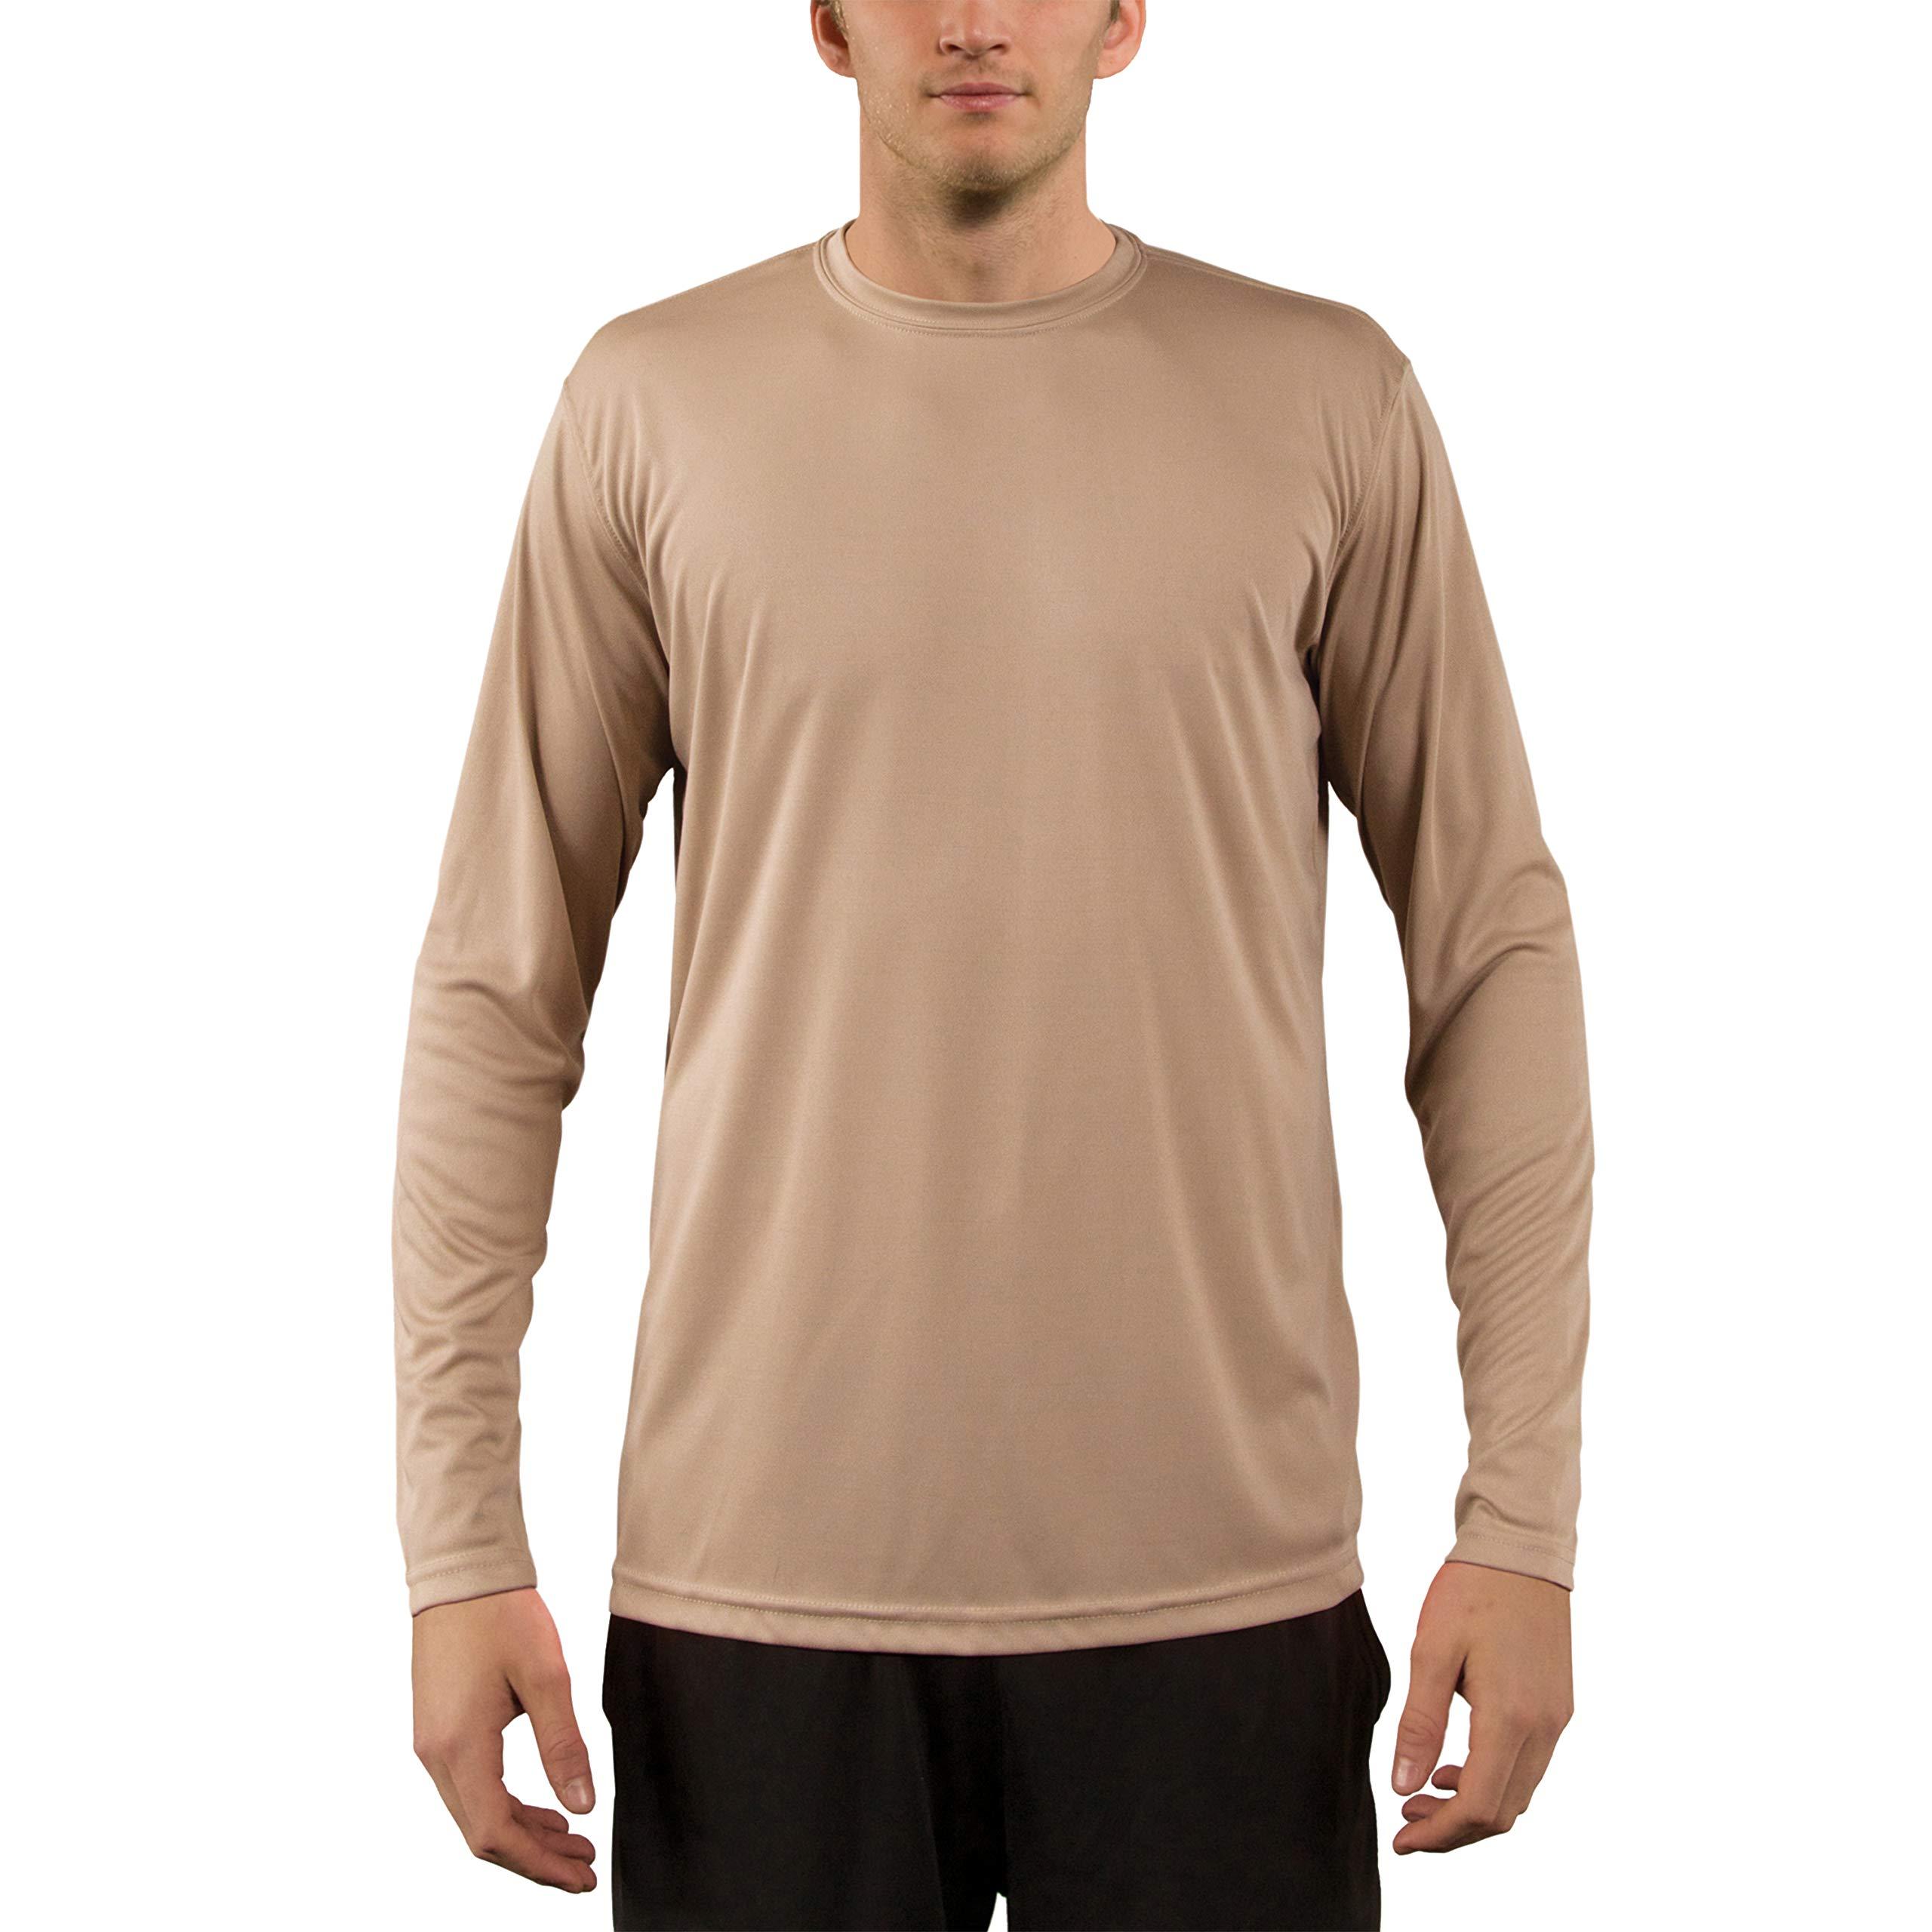 dedf26a797b Vapor Apparel Men s UPF 50+ UV Sun Protection Performance Long Sleeve  T-Shirt